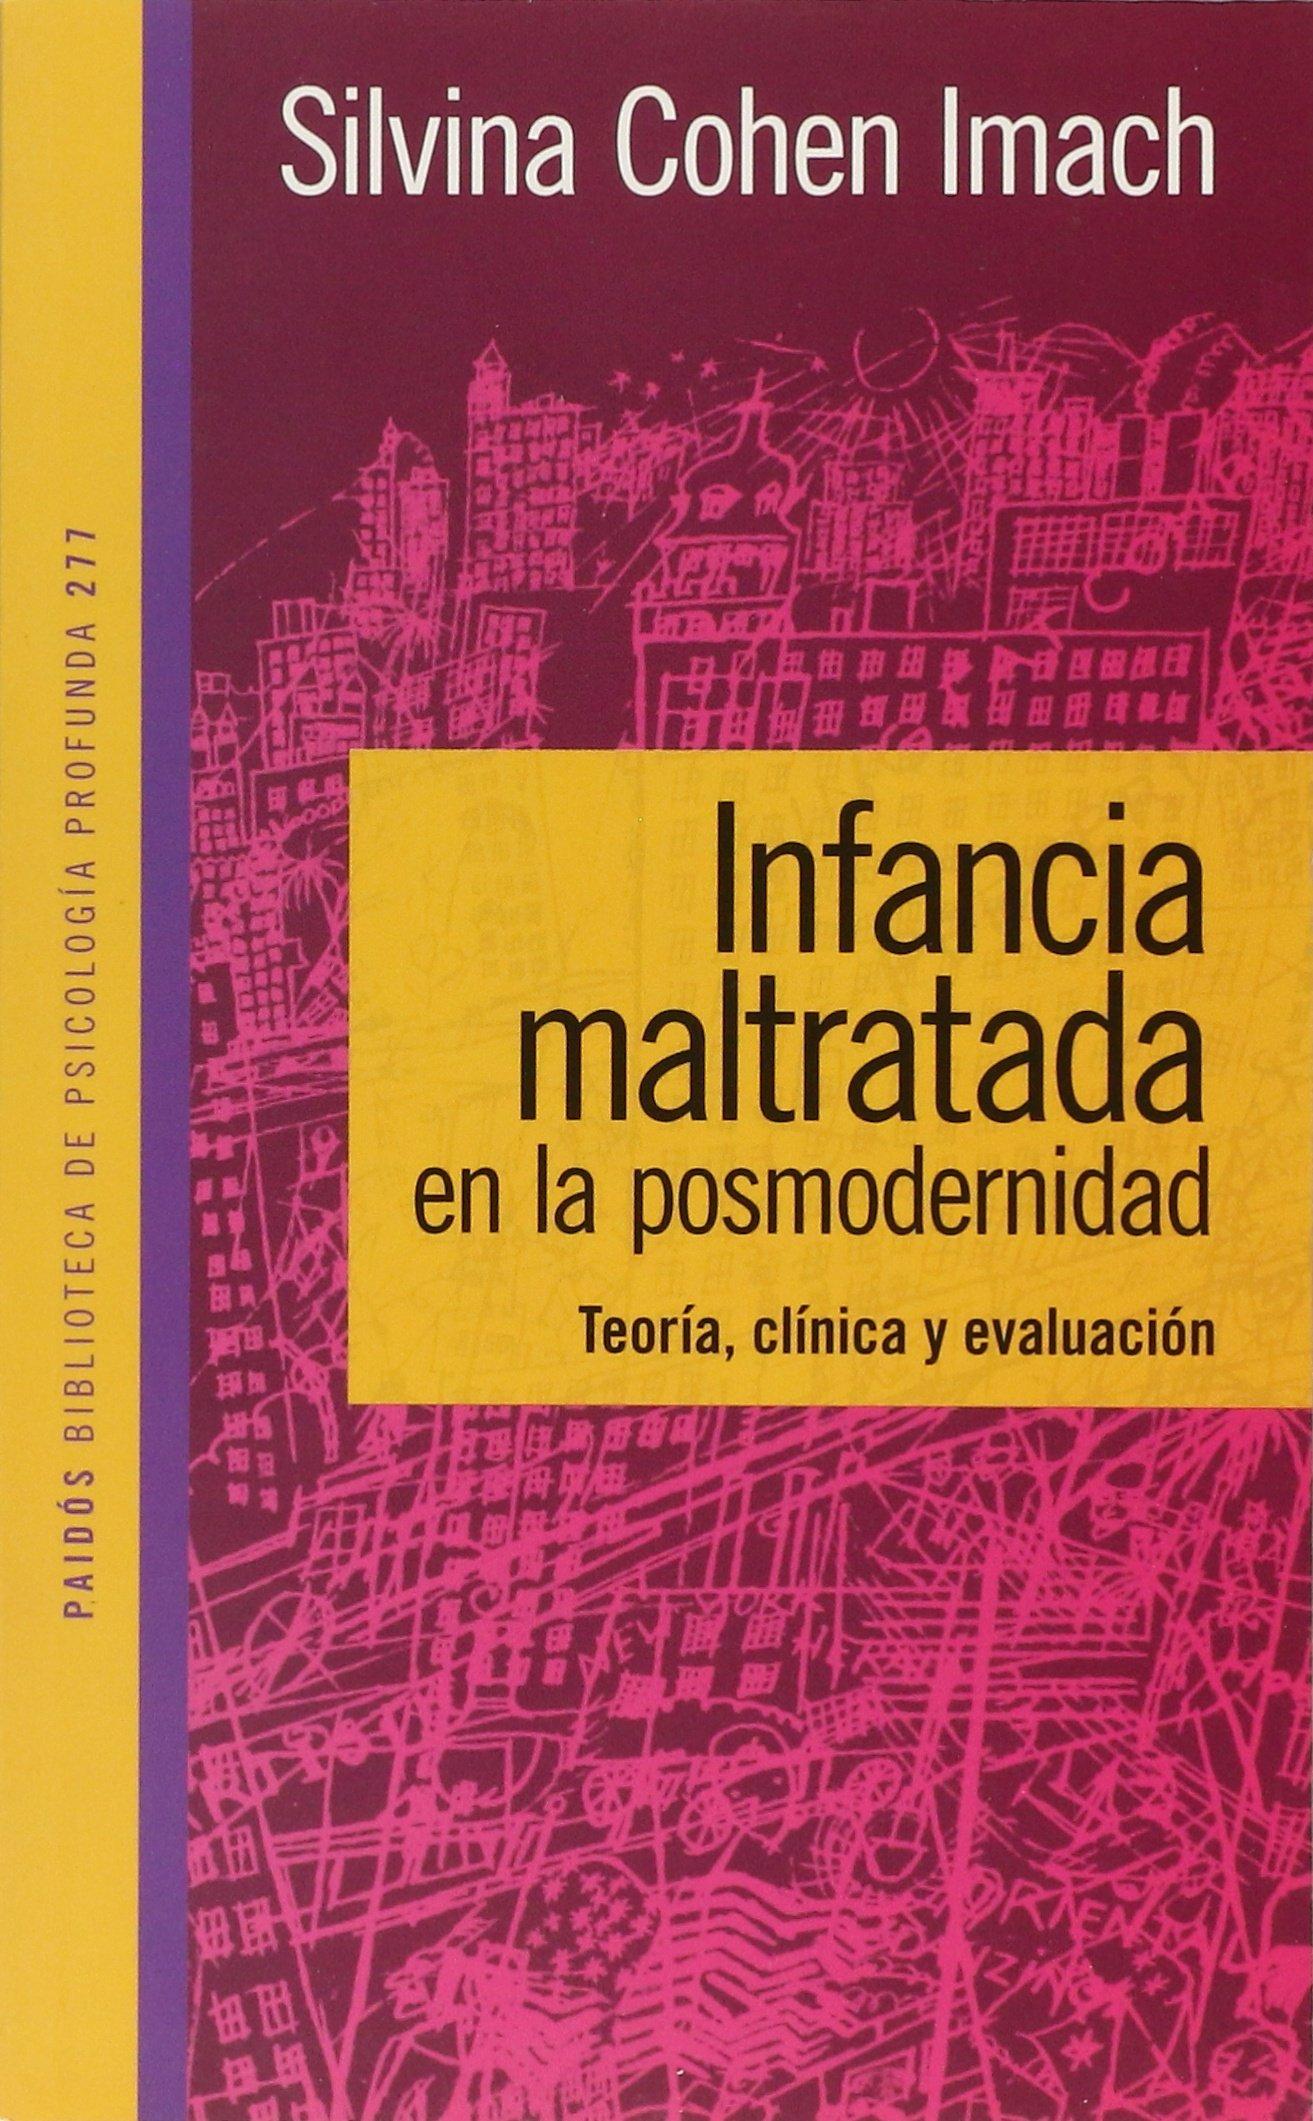 INFANCIA MALTRATADA EN LA POSMODERNIDAD (Spanish Edition): COHEN: 9789501242775: Amazon.com: Books